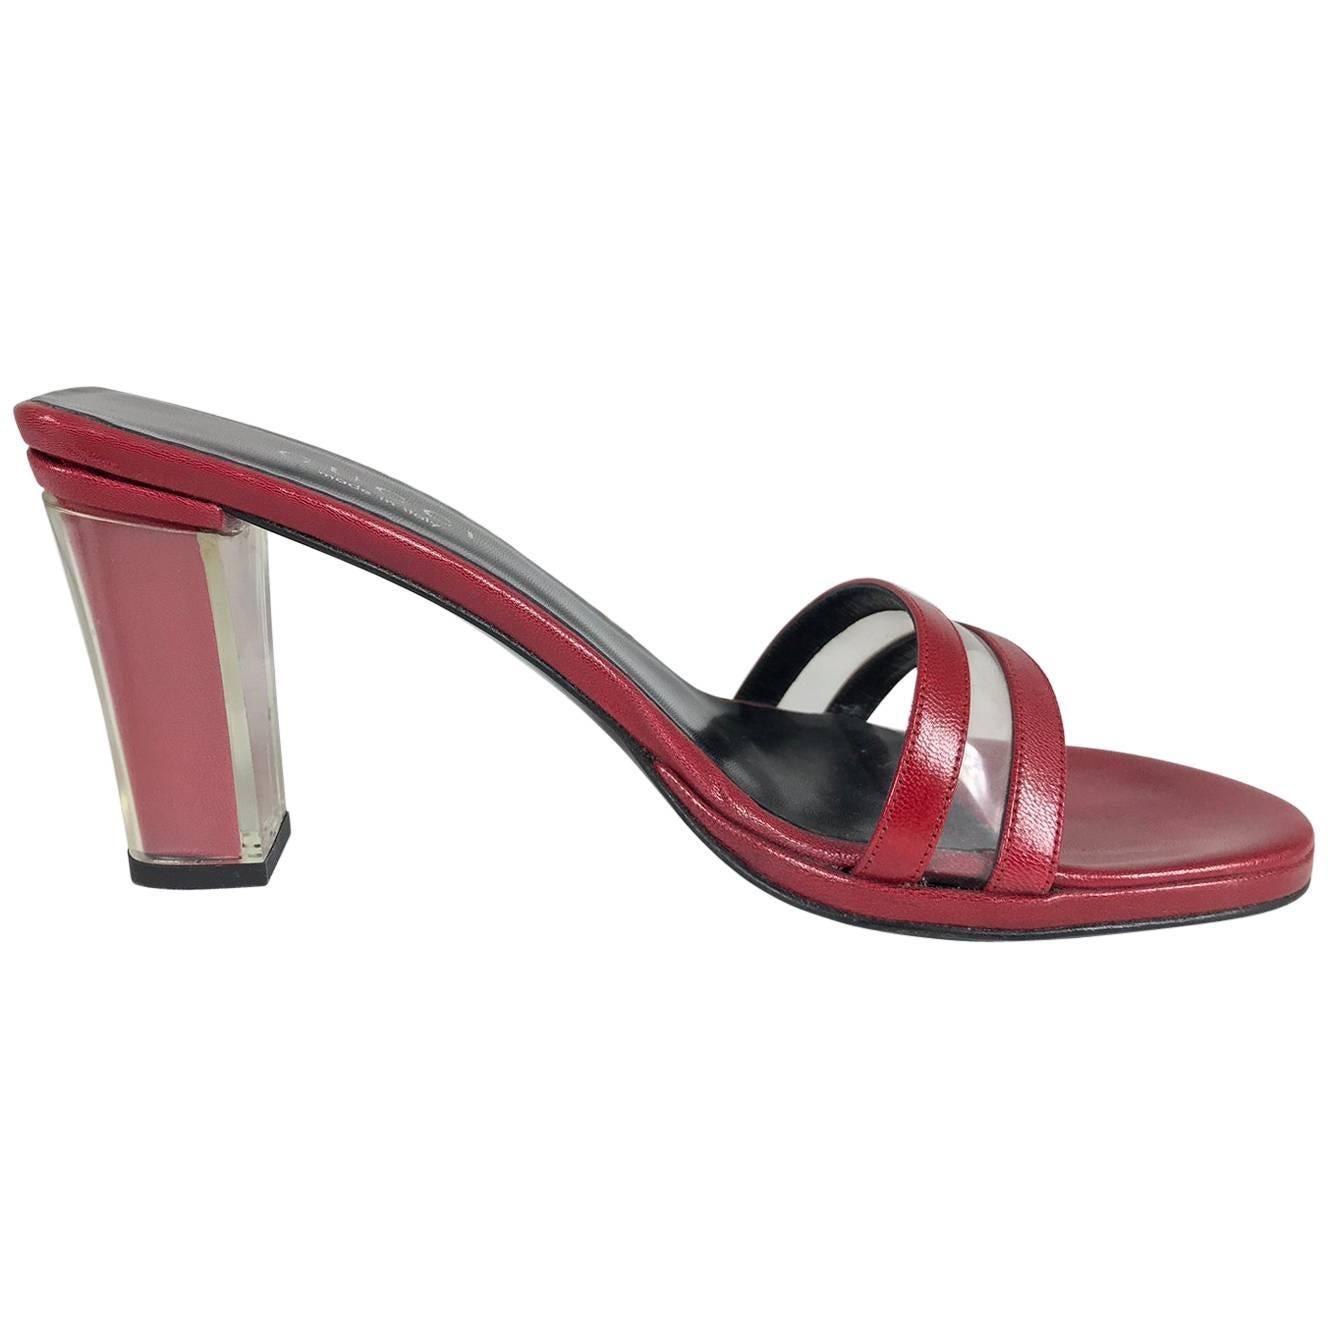 Gucci wine red leather Lucite heel mules 9B Unworn